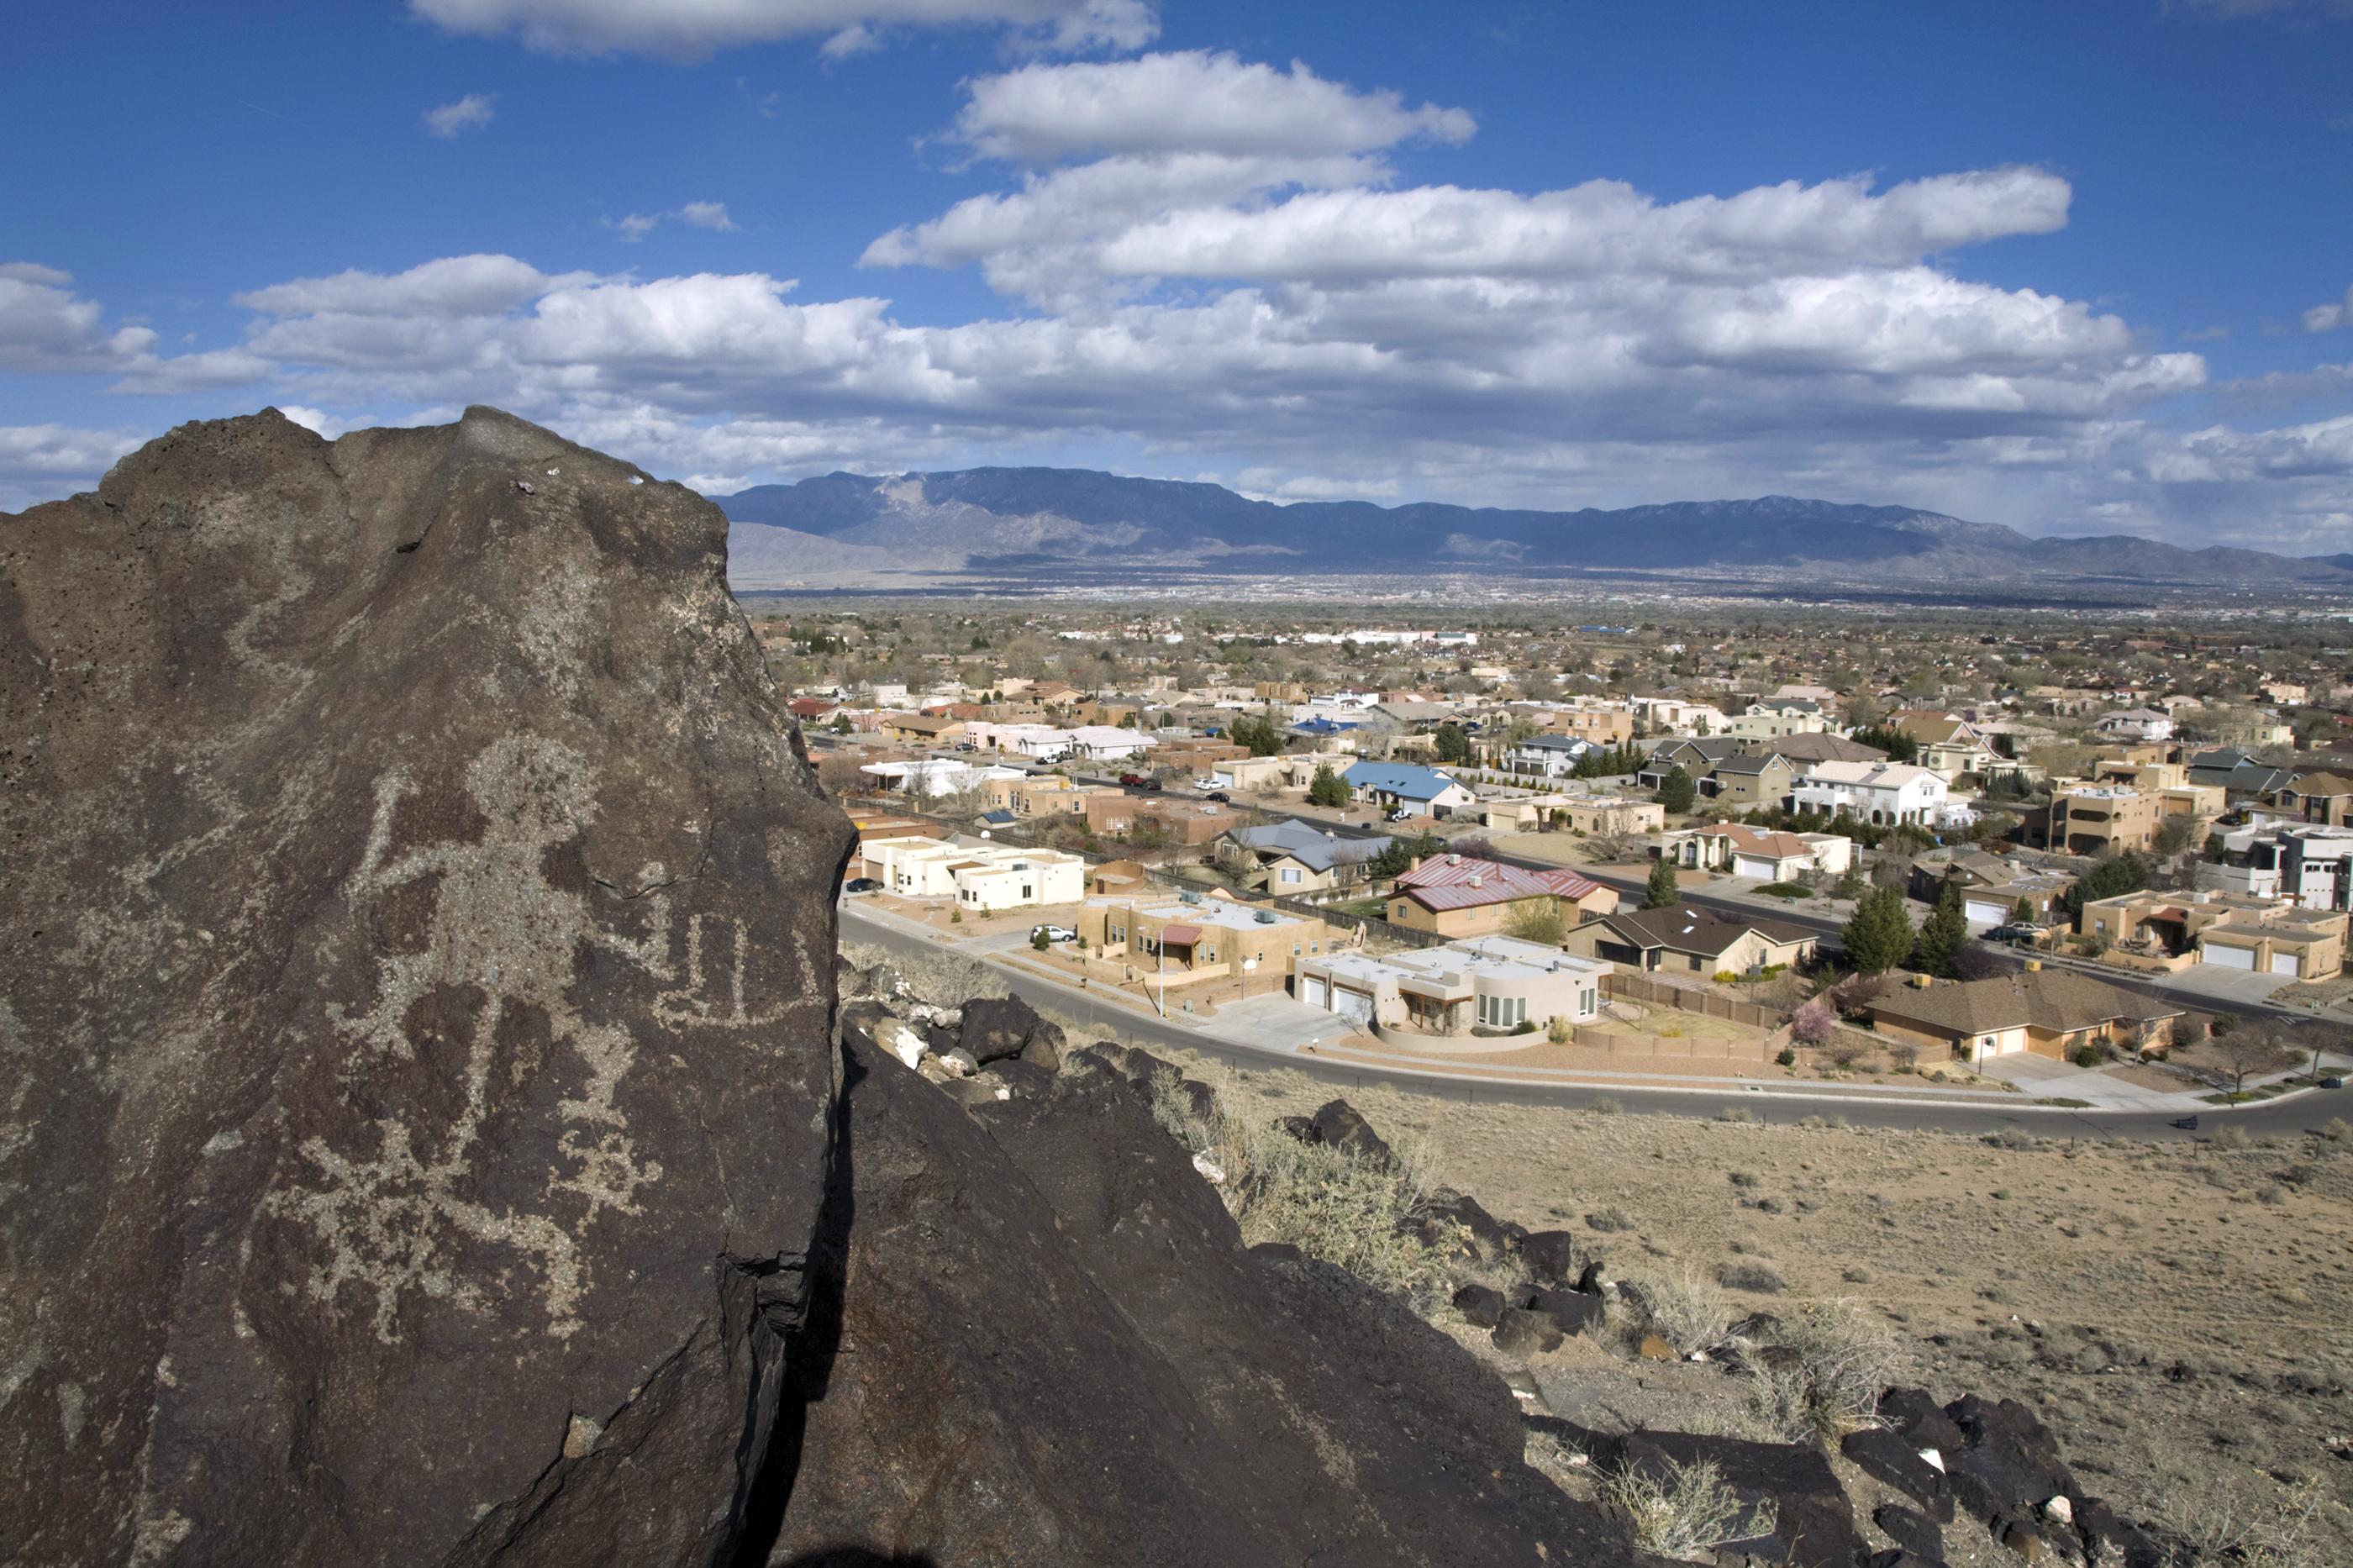 Prehistoric petroglyphs and heavy urbanization in the background.